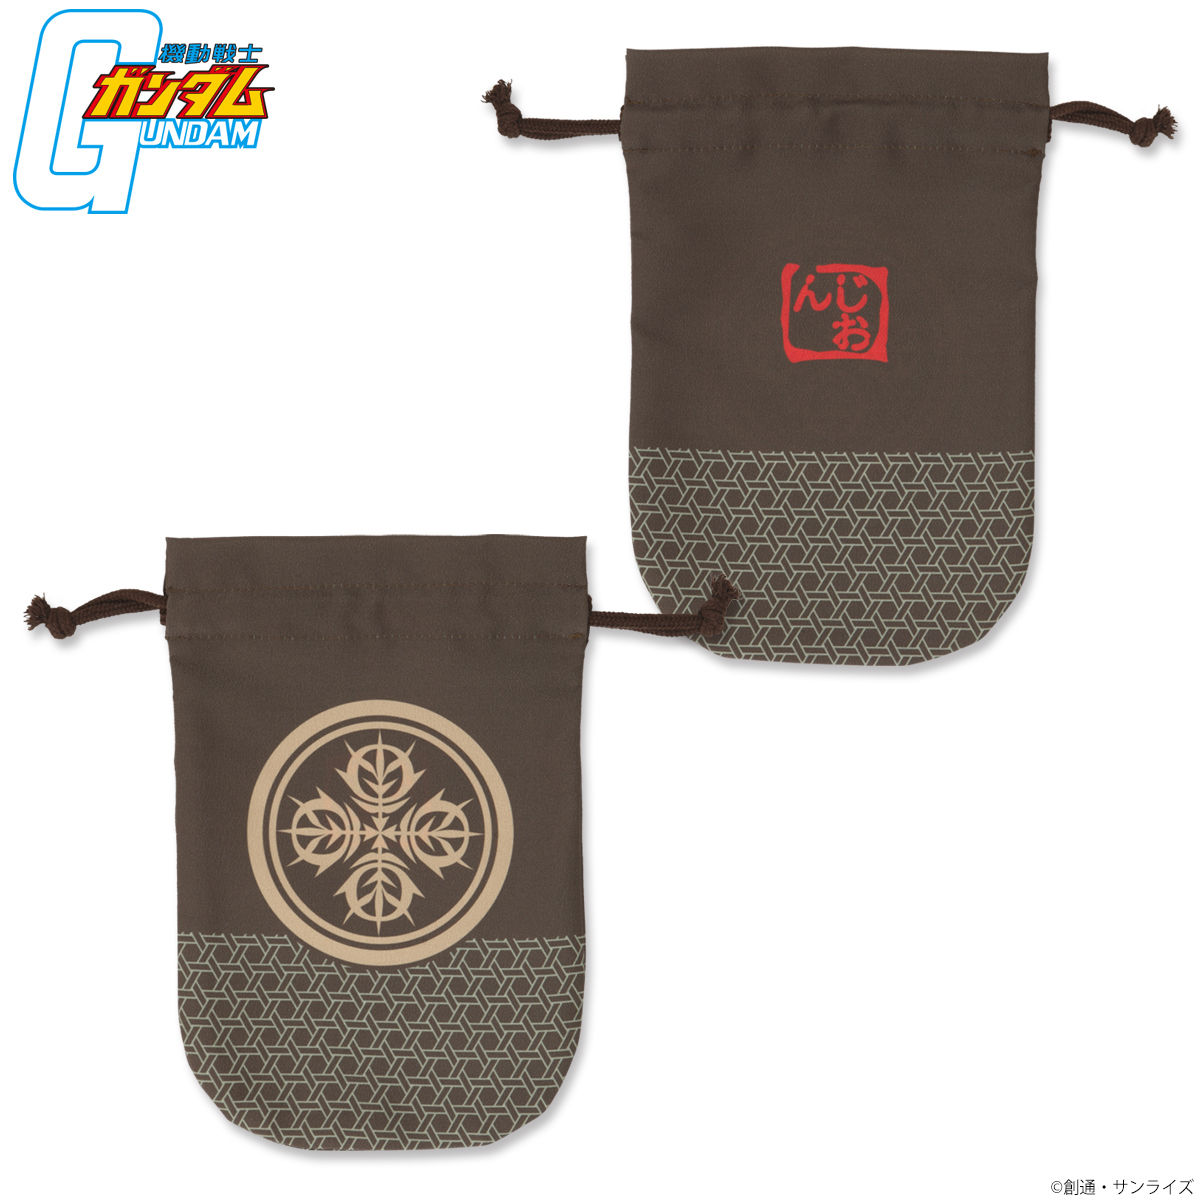 Mobile Suit Gundam Japanese Family Crest Drawstring Pouch